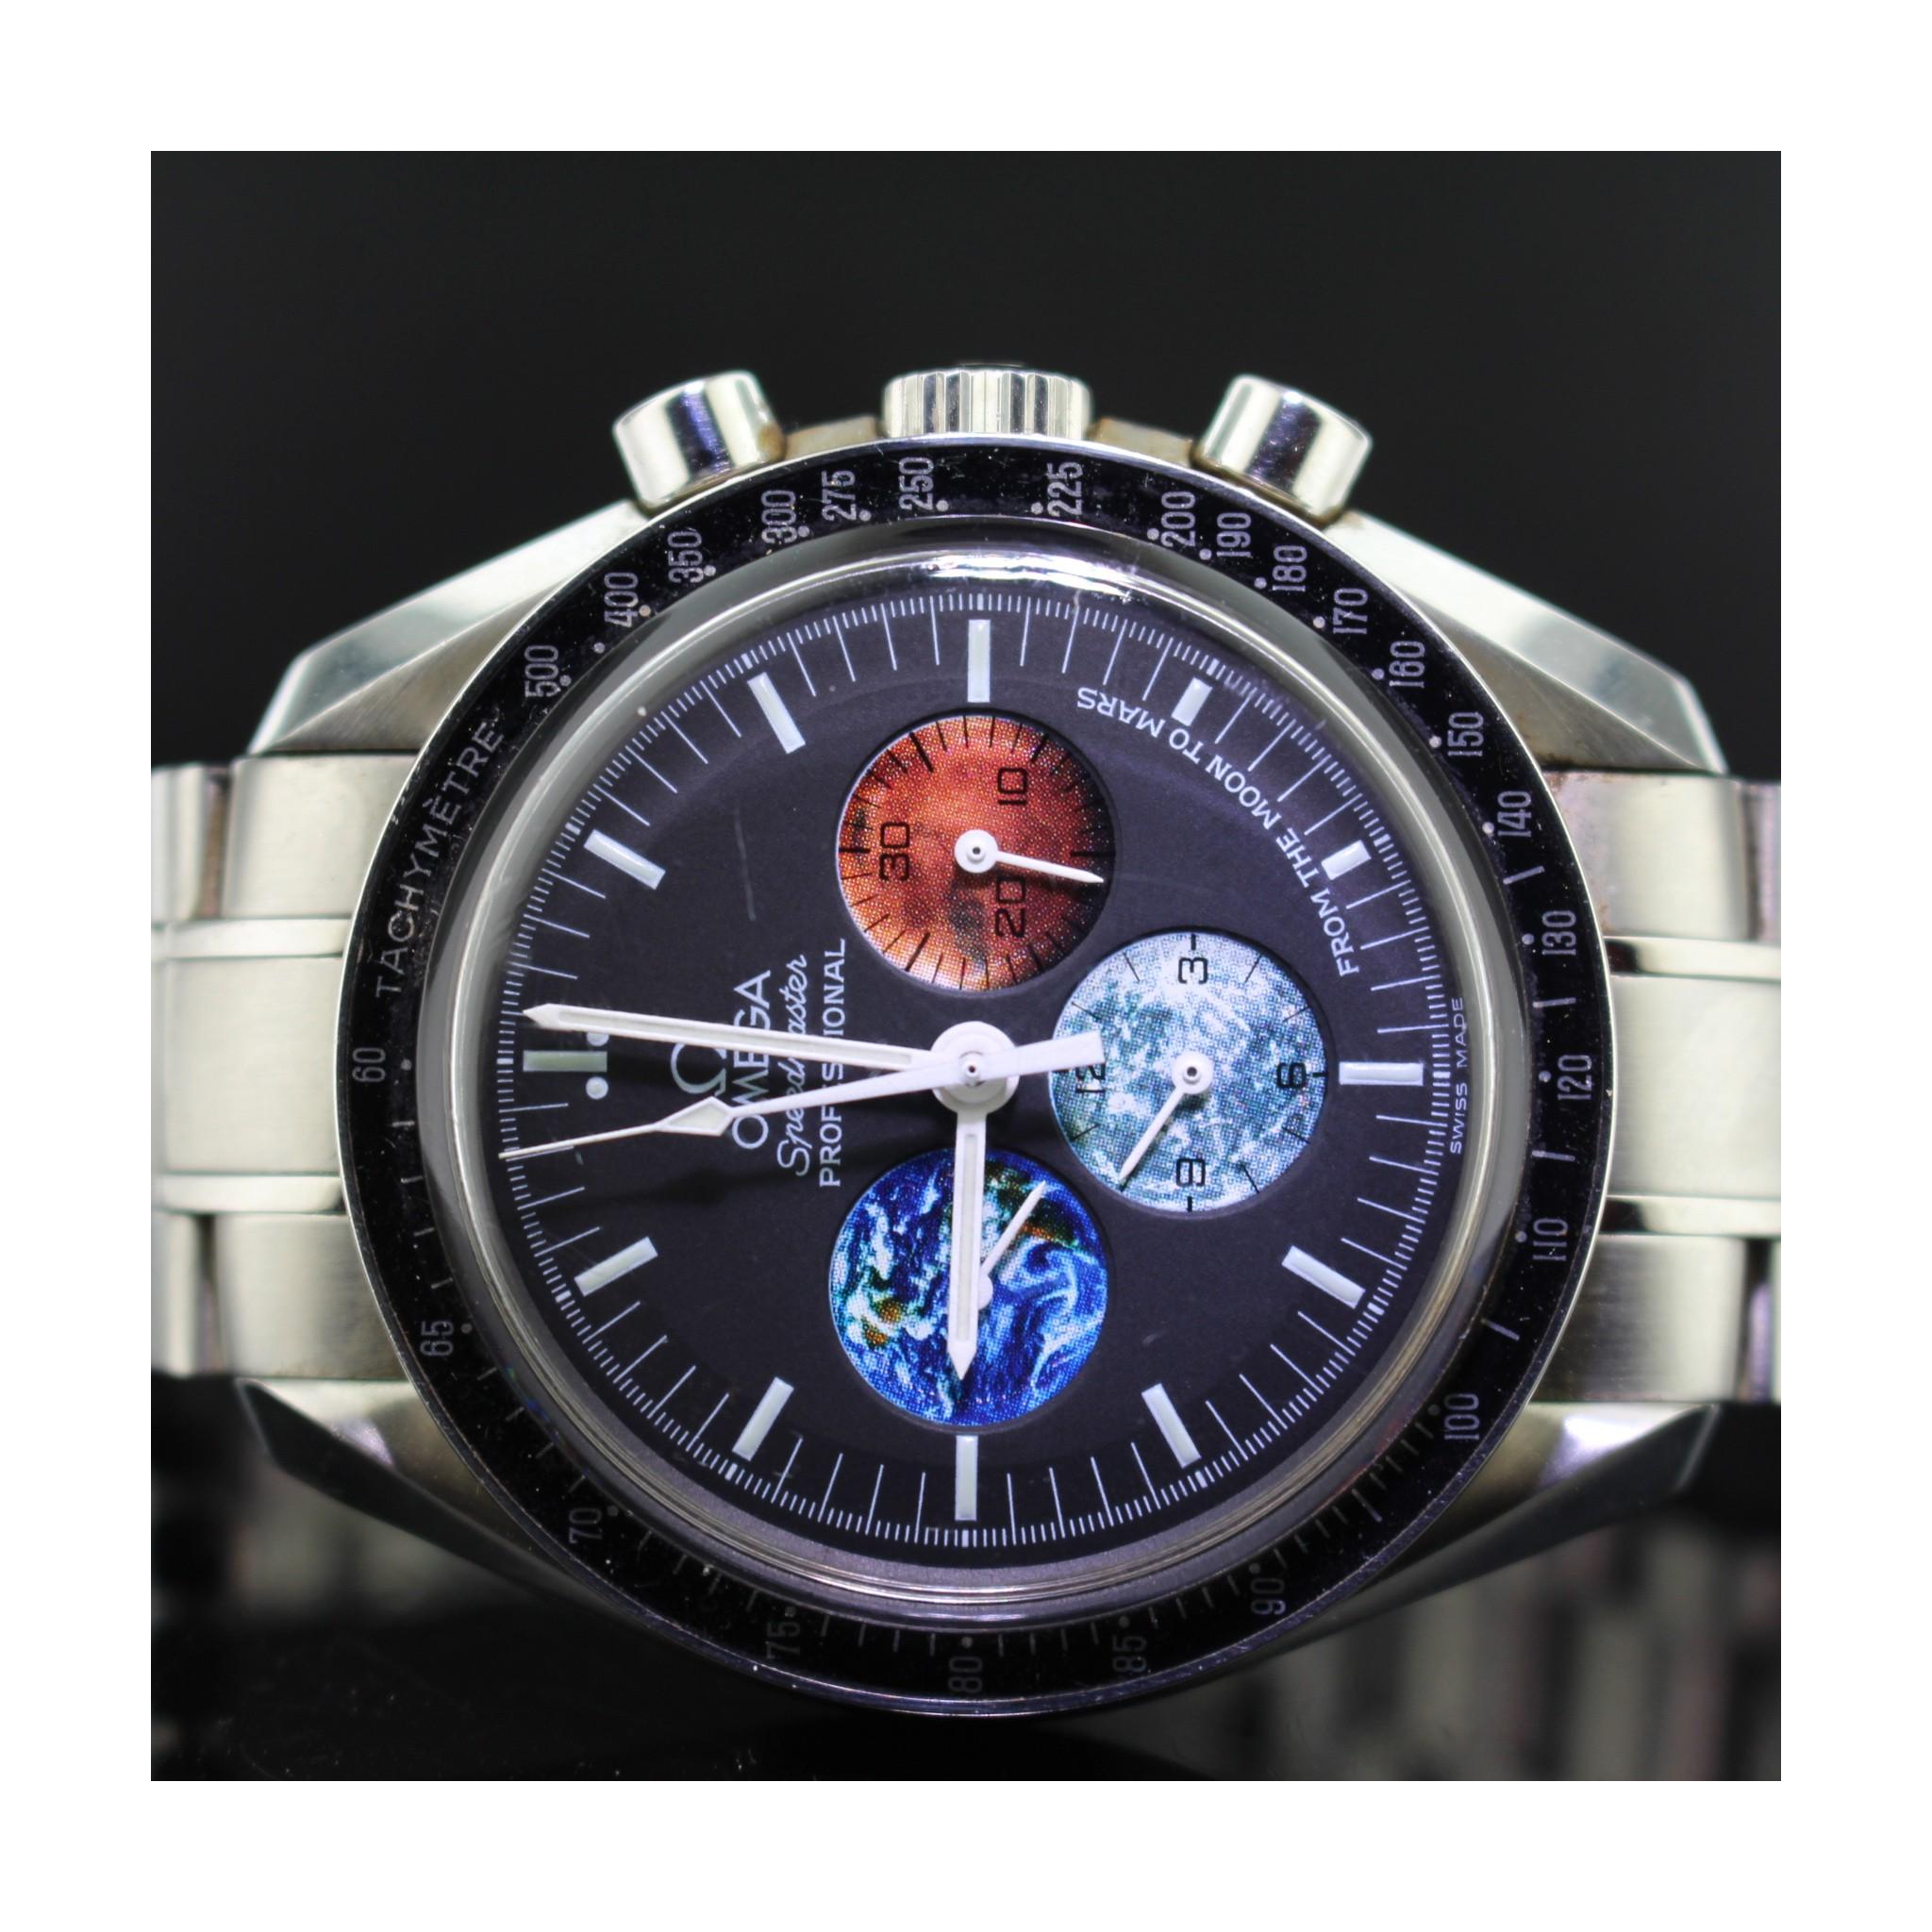 Omega Speedmaster Professional Moonwatch | Riccione